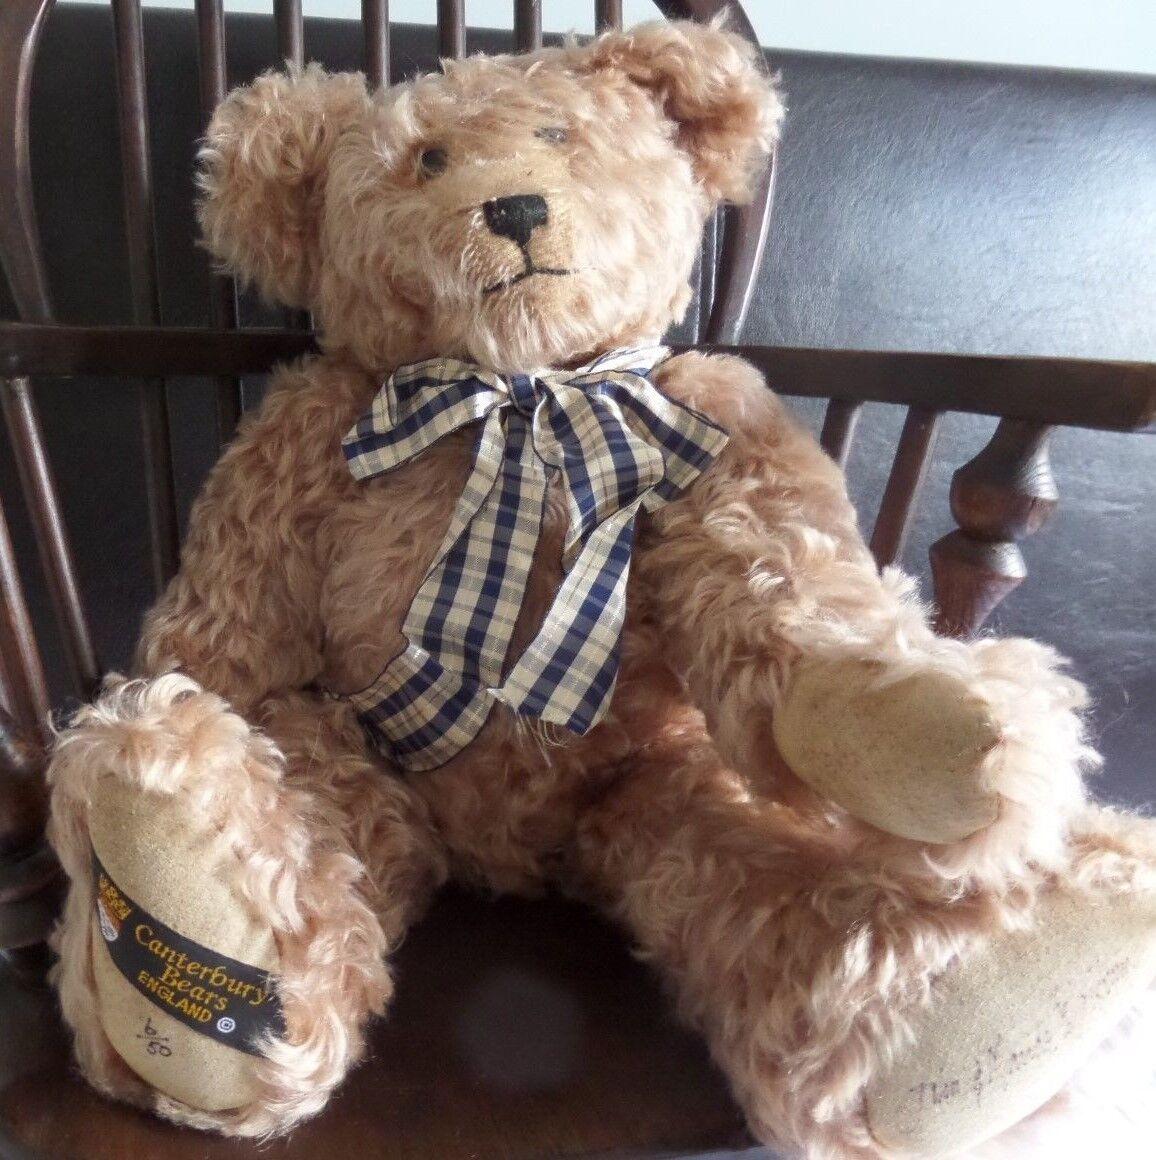 JOHN schwarzBURN CANTERBURY BEARS MOHAIR BEAR LTD ED 6 0F 50